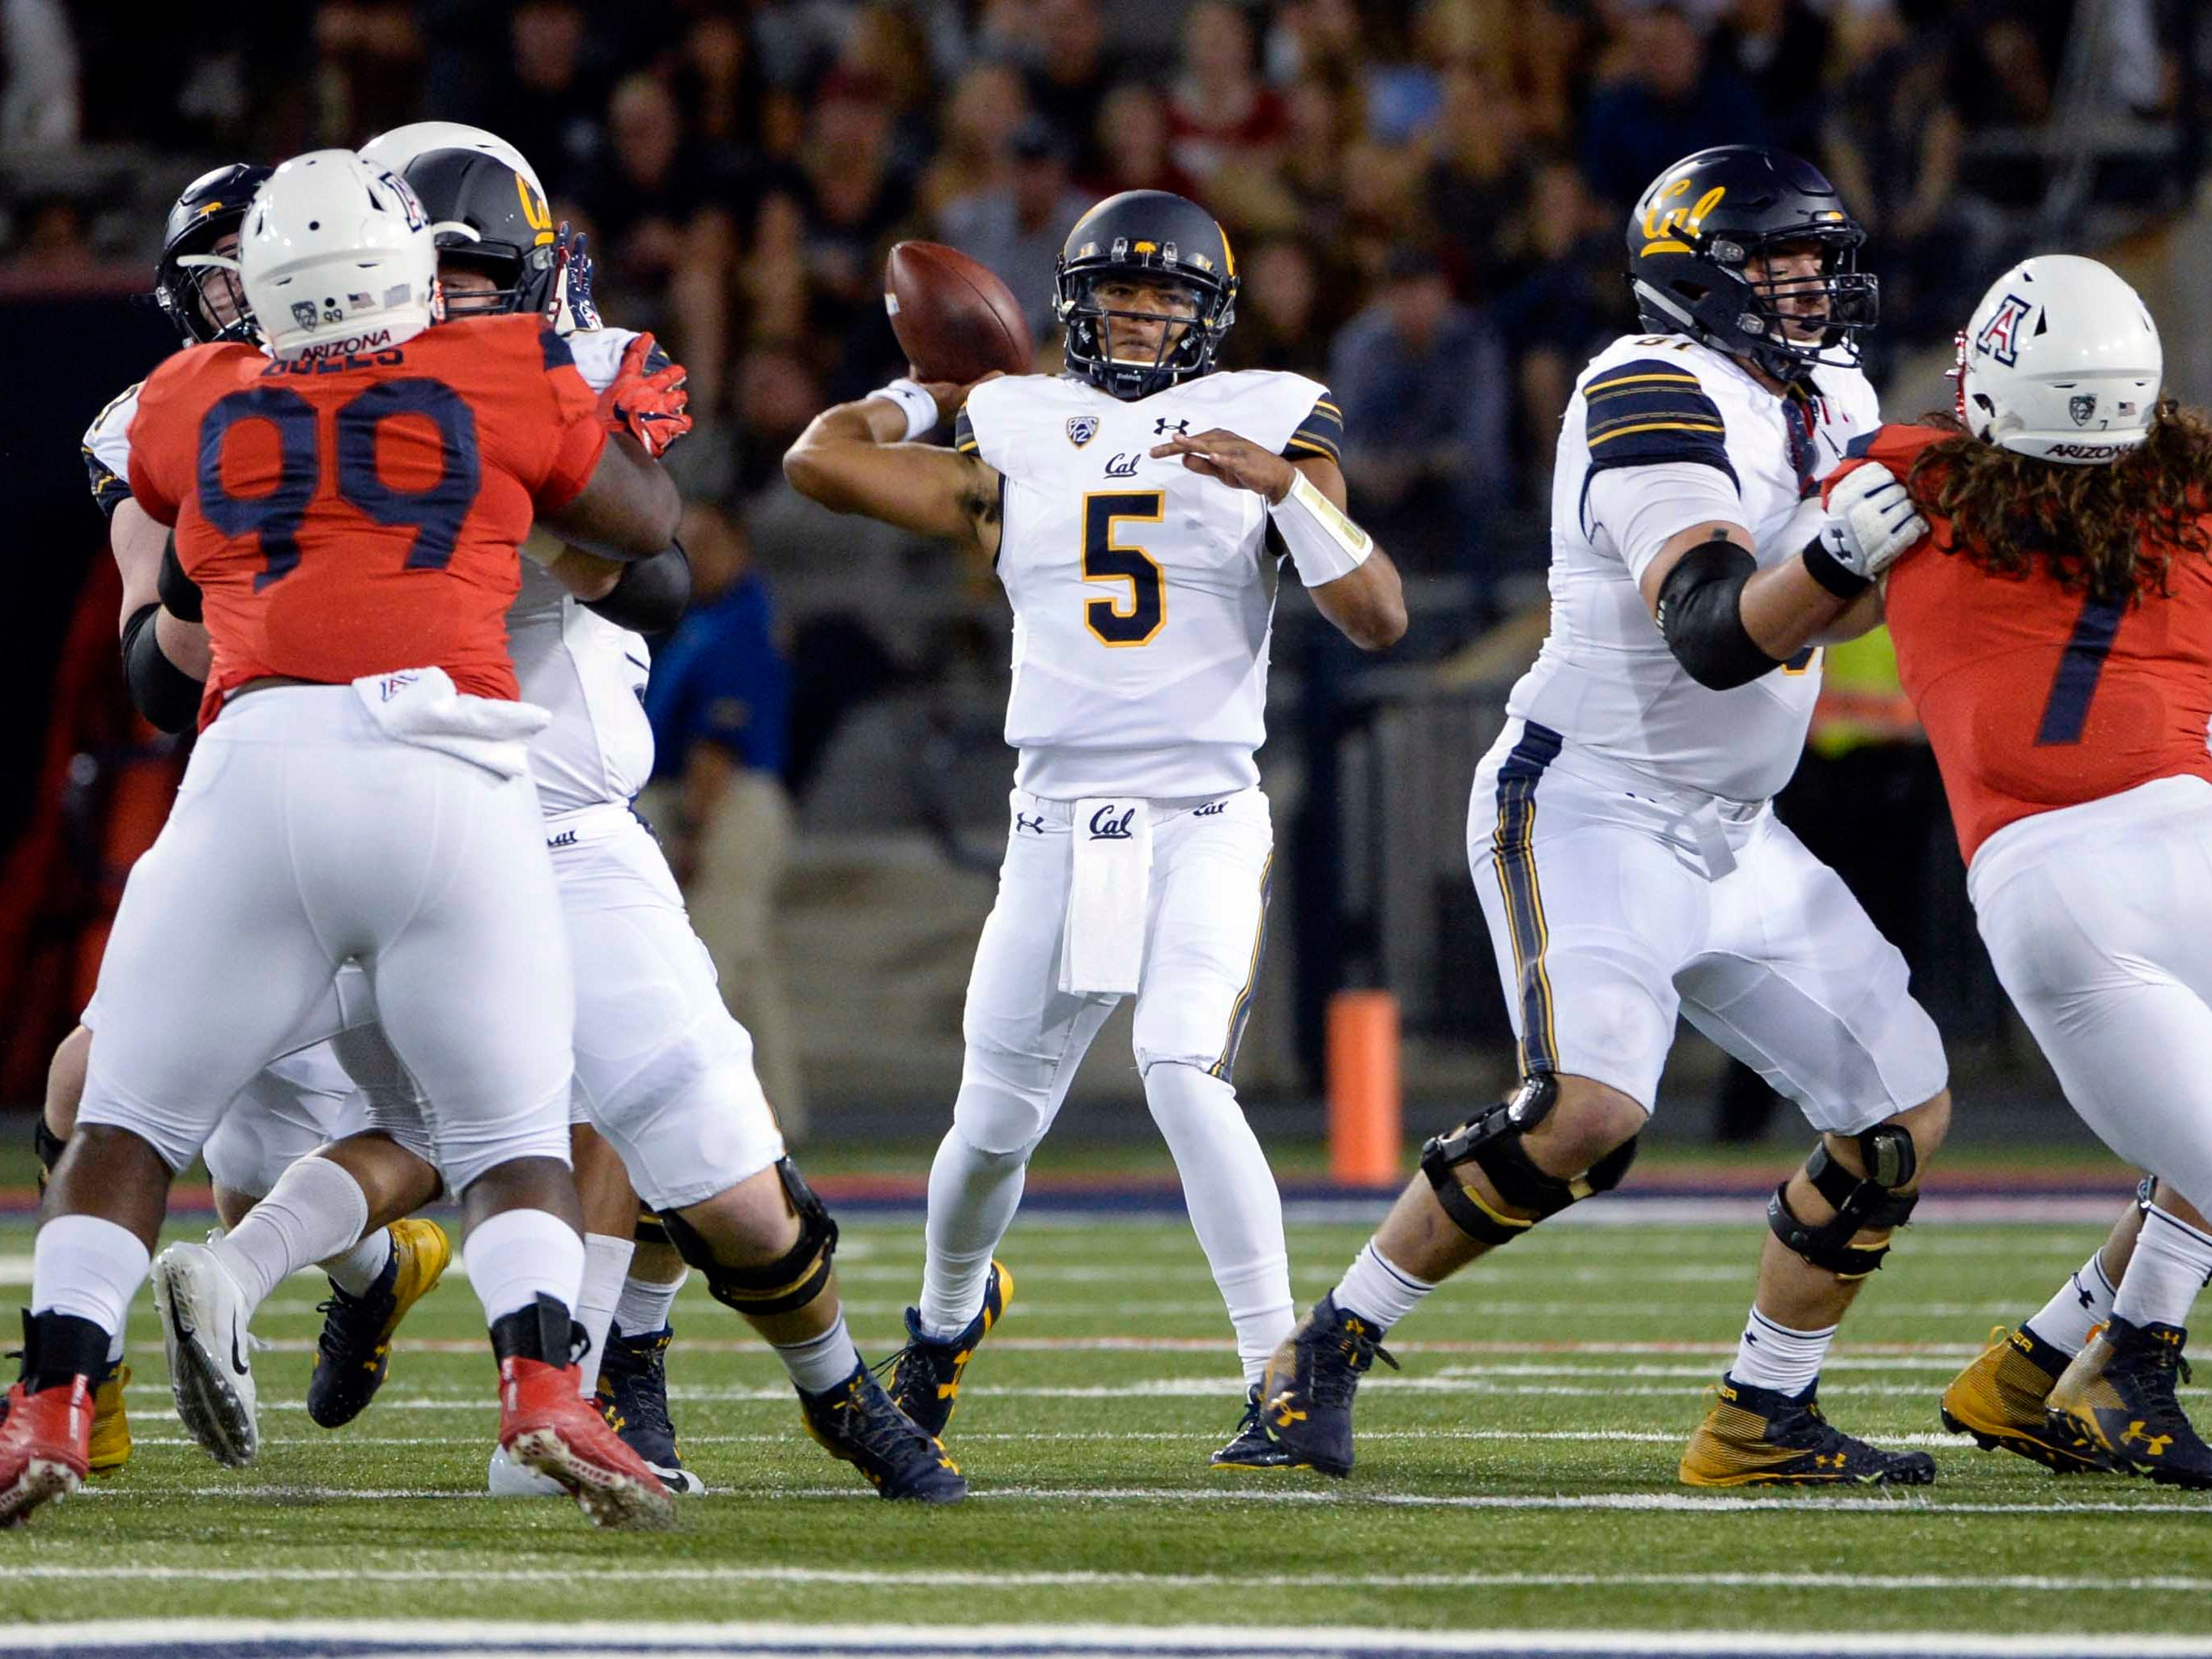 Oct 6, 2018; Tucson, AZ, USA; California Golden Bears quarterback Brandon McIlwain (5) passes the ball against the Arizona Wildcats during the first half at Arizona Stadium. Mandatory Credit: Casey Sapio-USA TODAY Sports